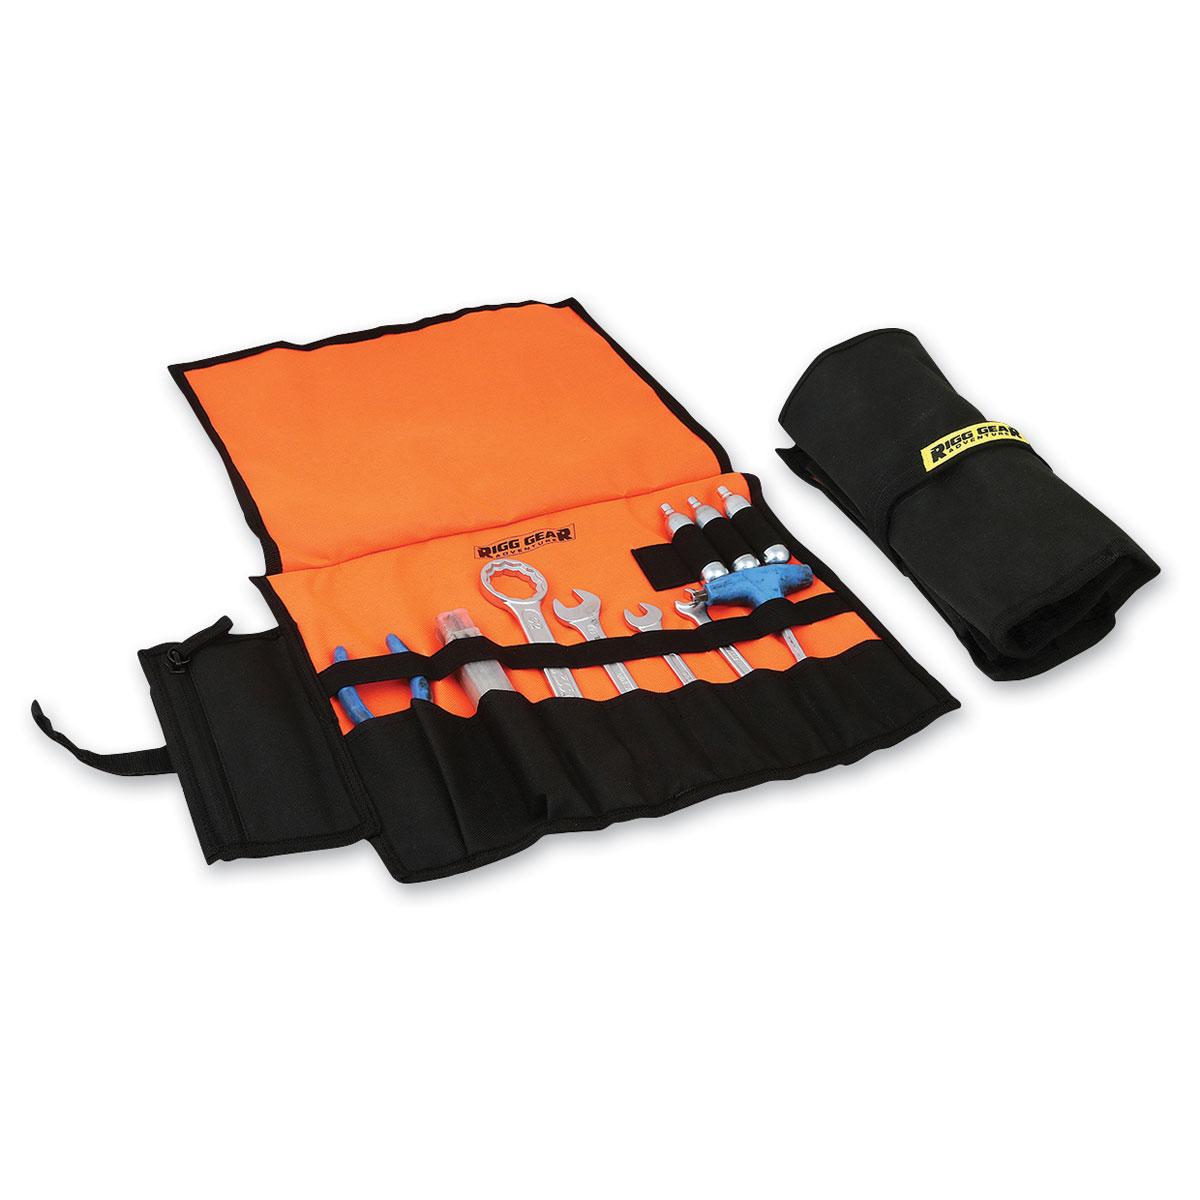 Nelson-Rigg Harley Black & Orange Tool Roll